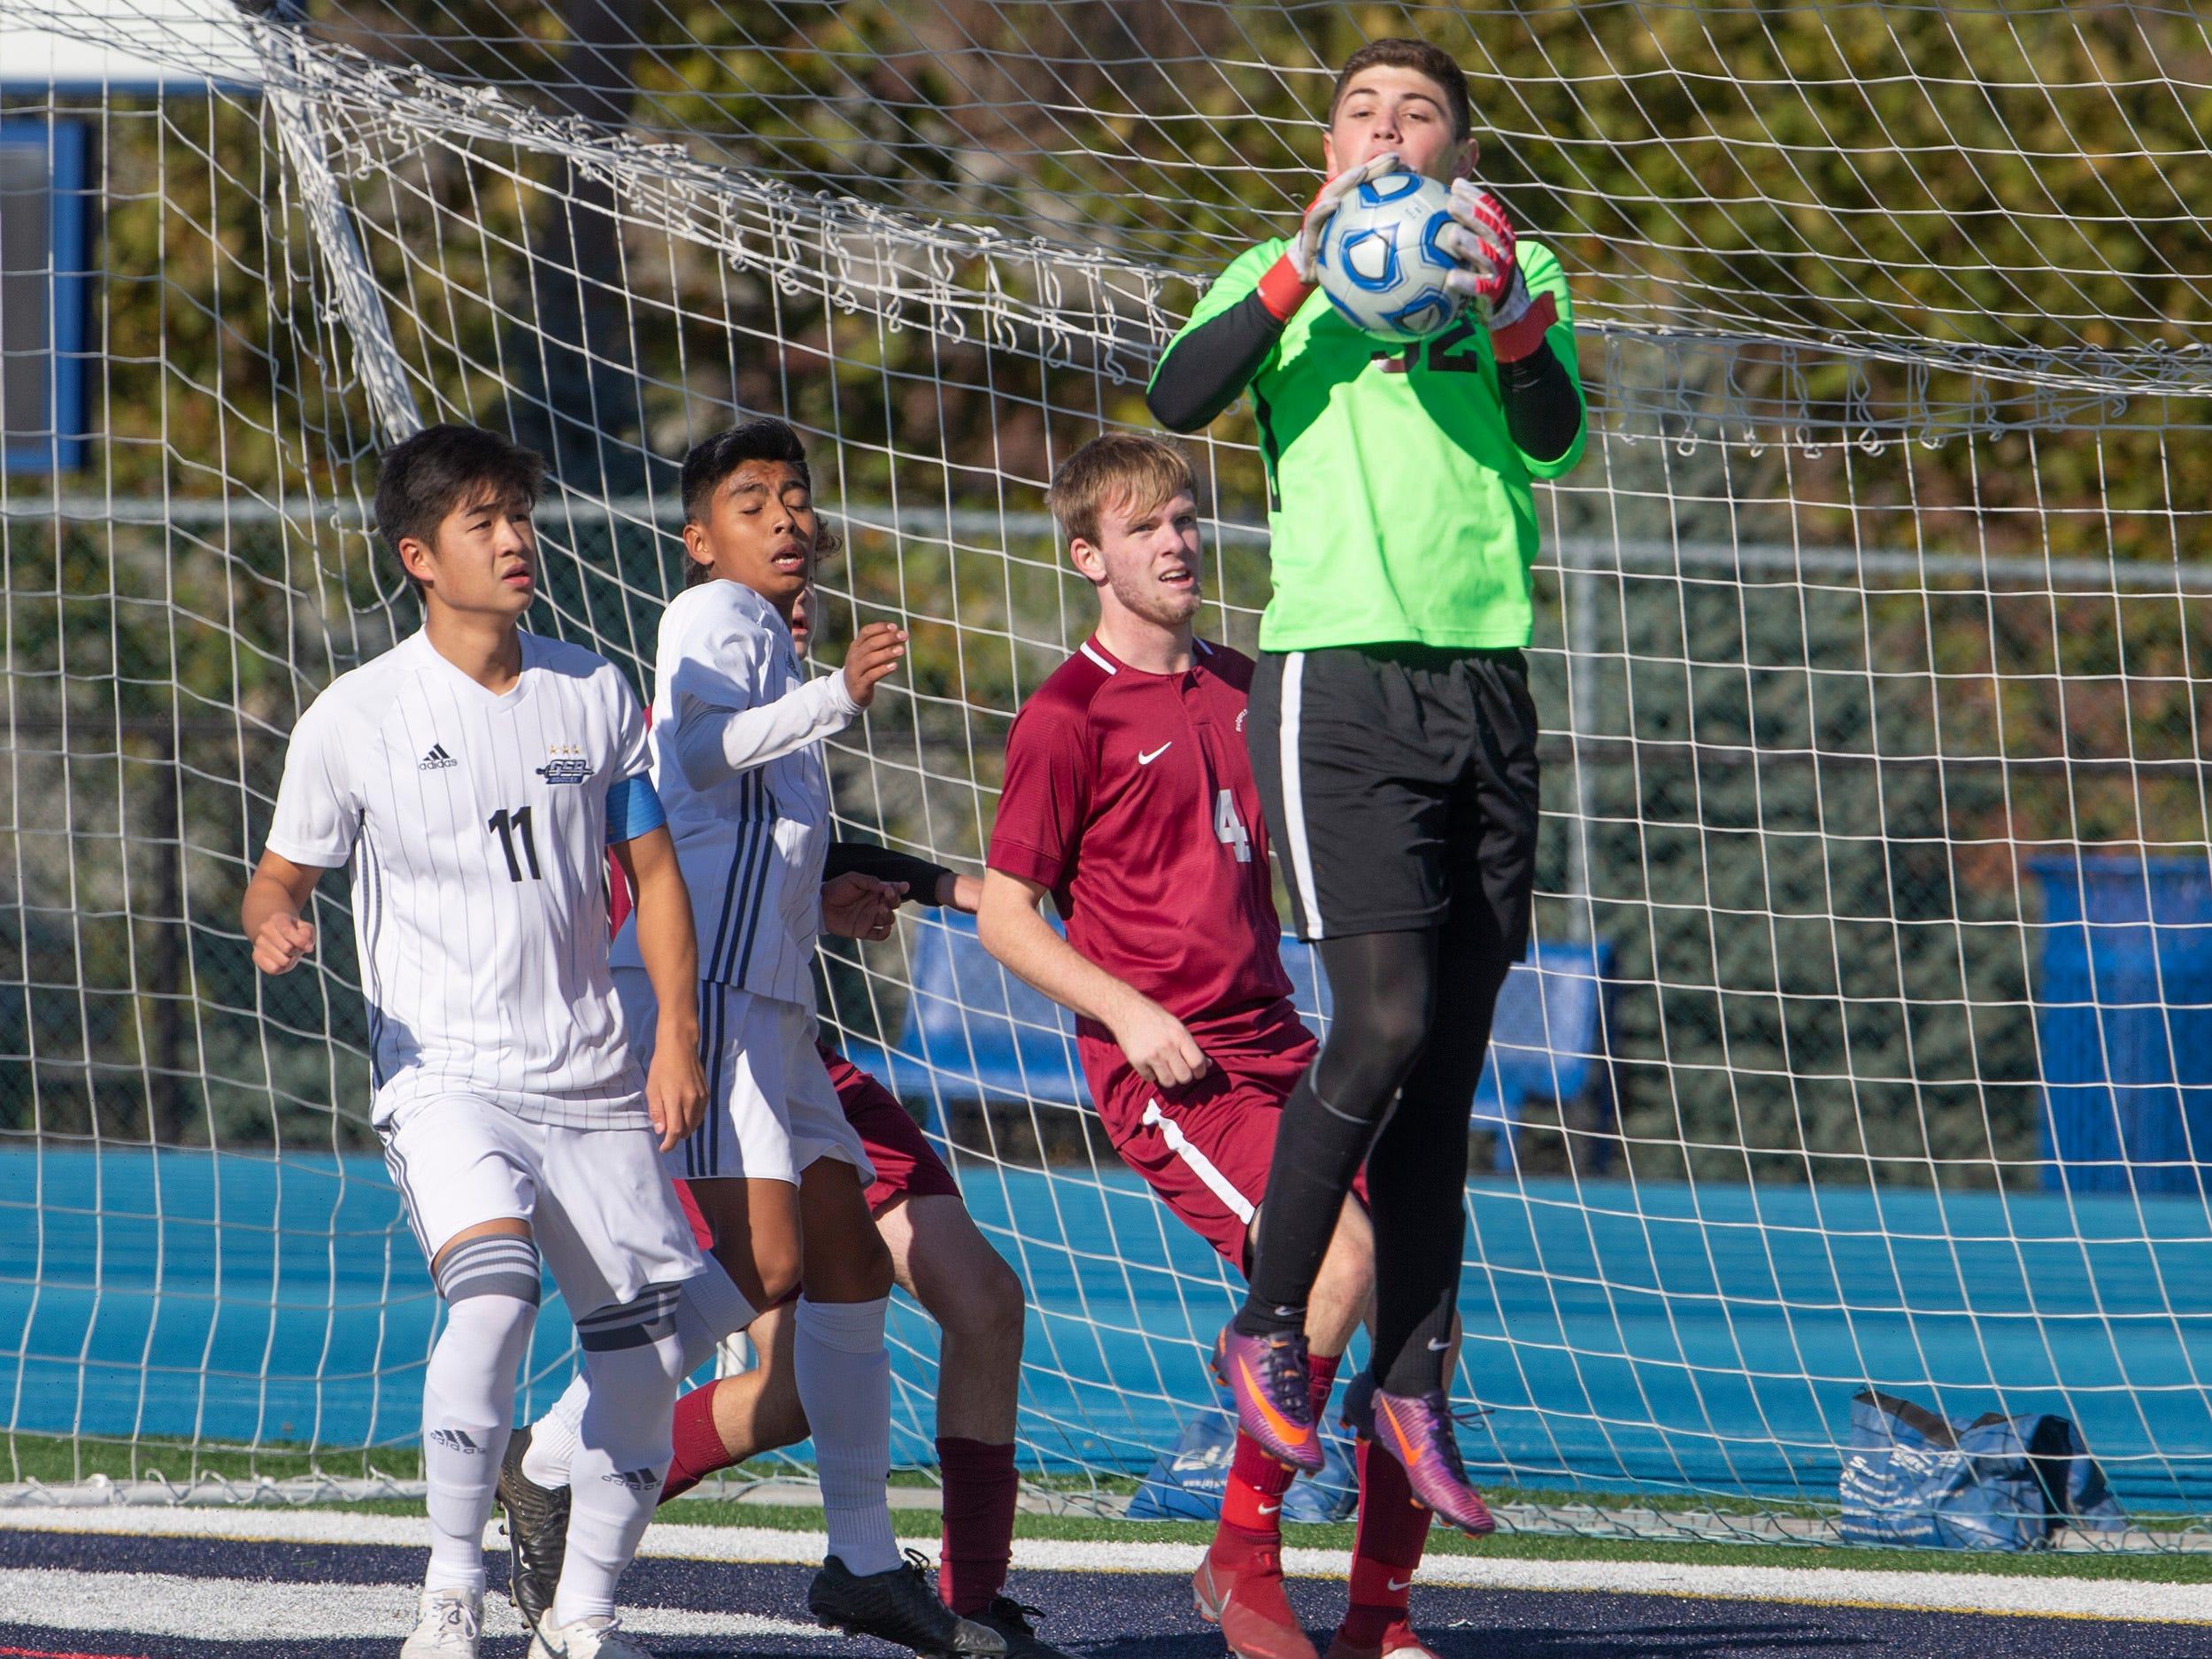 Delbarton vs Christian Brothers Academy in NJSIAA Boys Non-public A State Soccer Final.